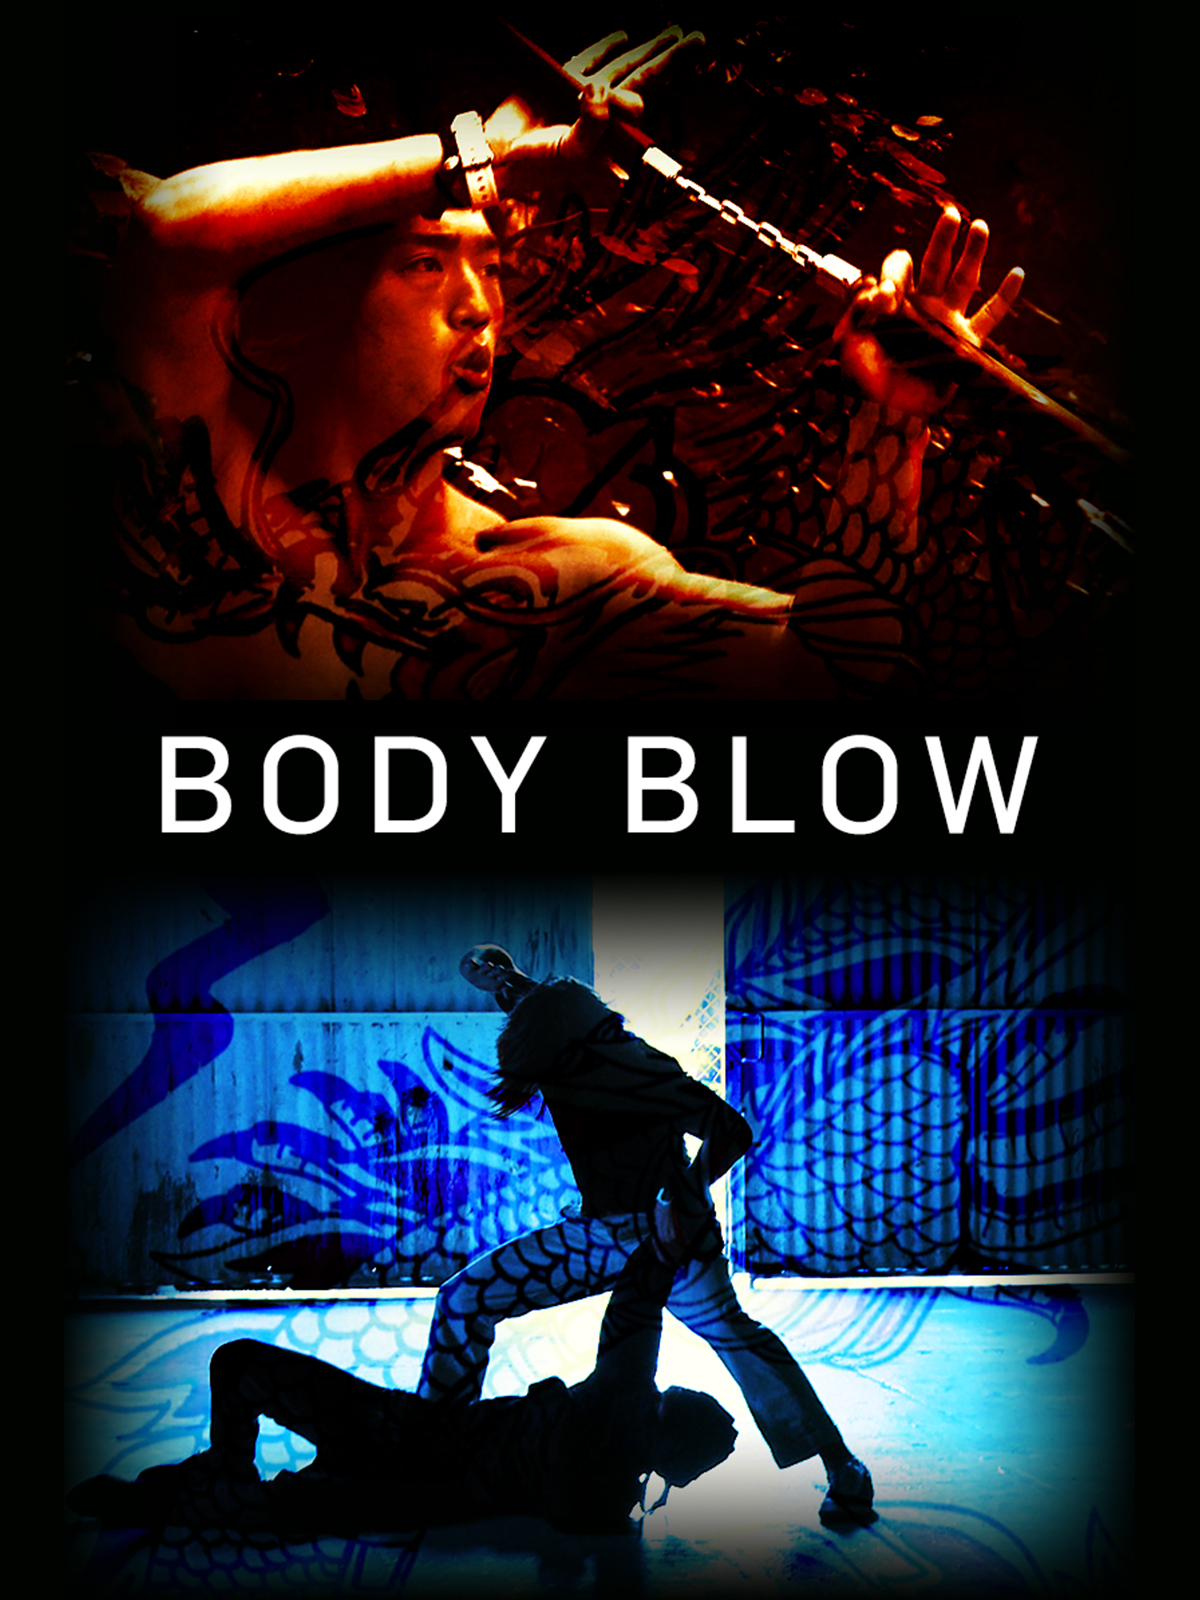 Here-BodyBlow-Full-Image-en-US.jpg